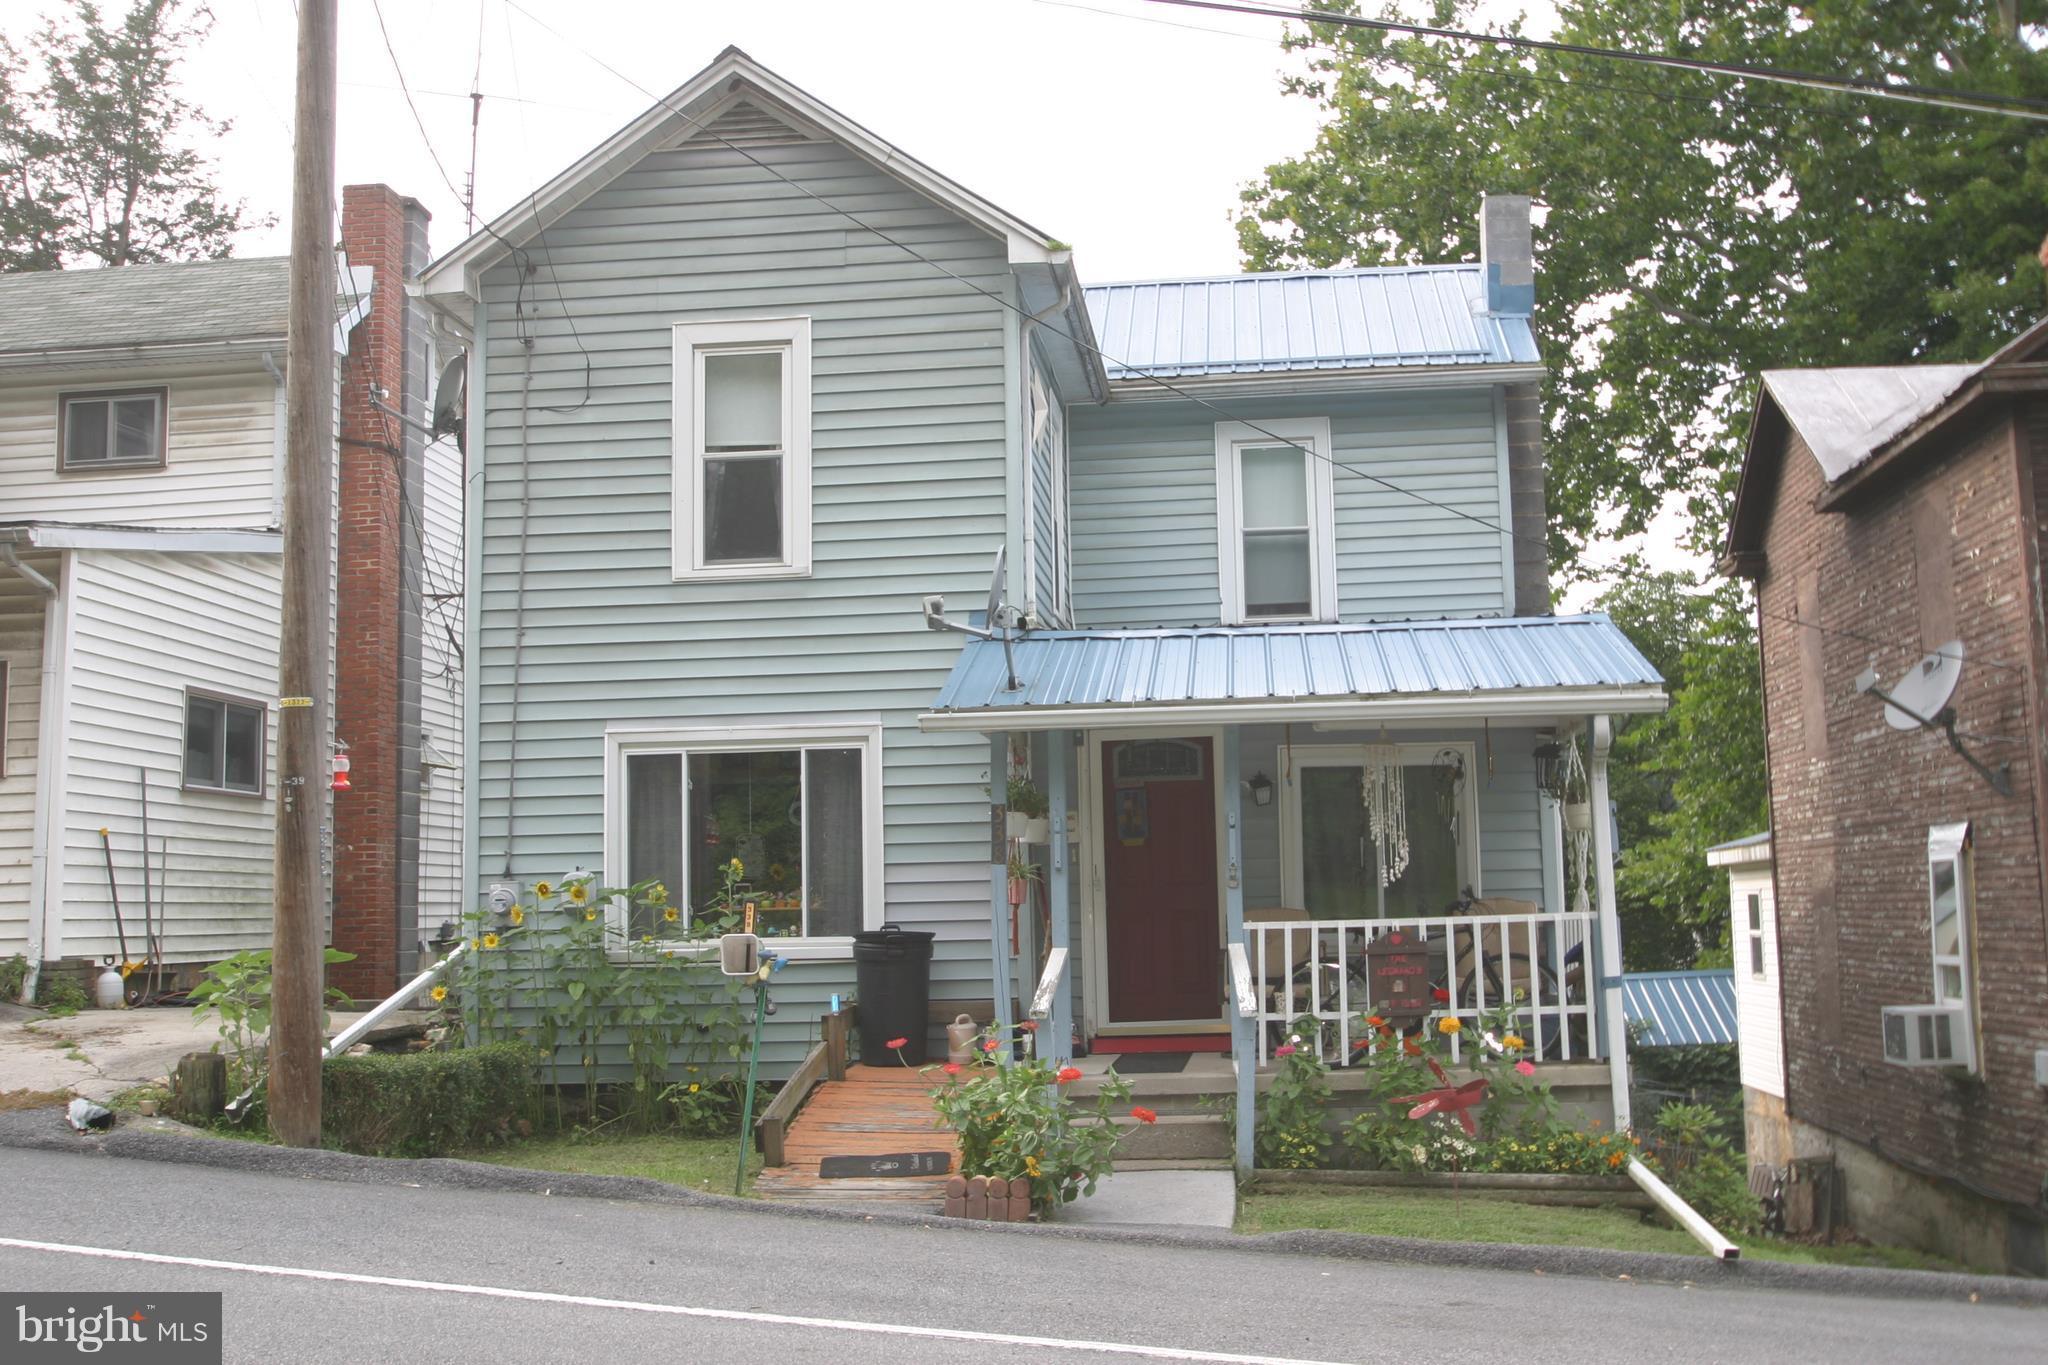 338 CAMPBELL STREET, MAPLETON DEPOT, PA 17052